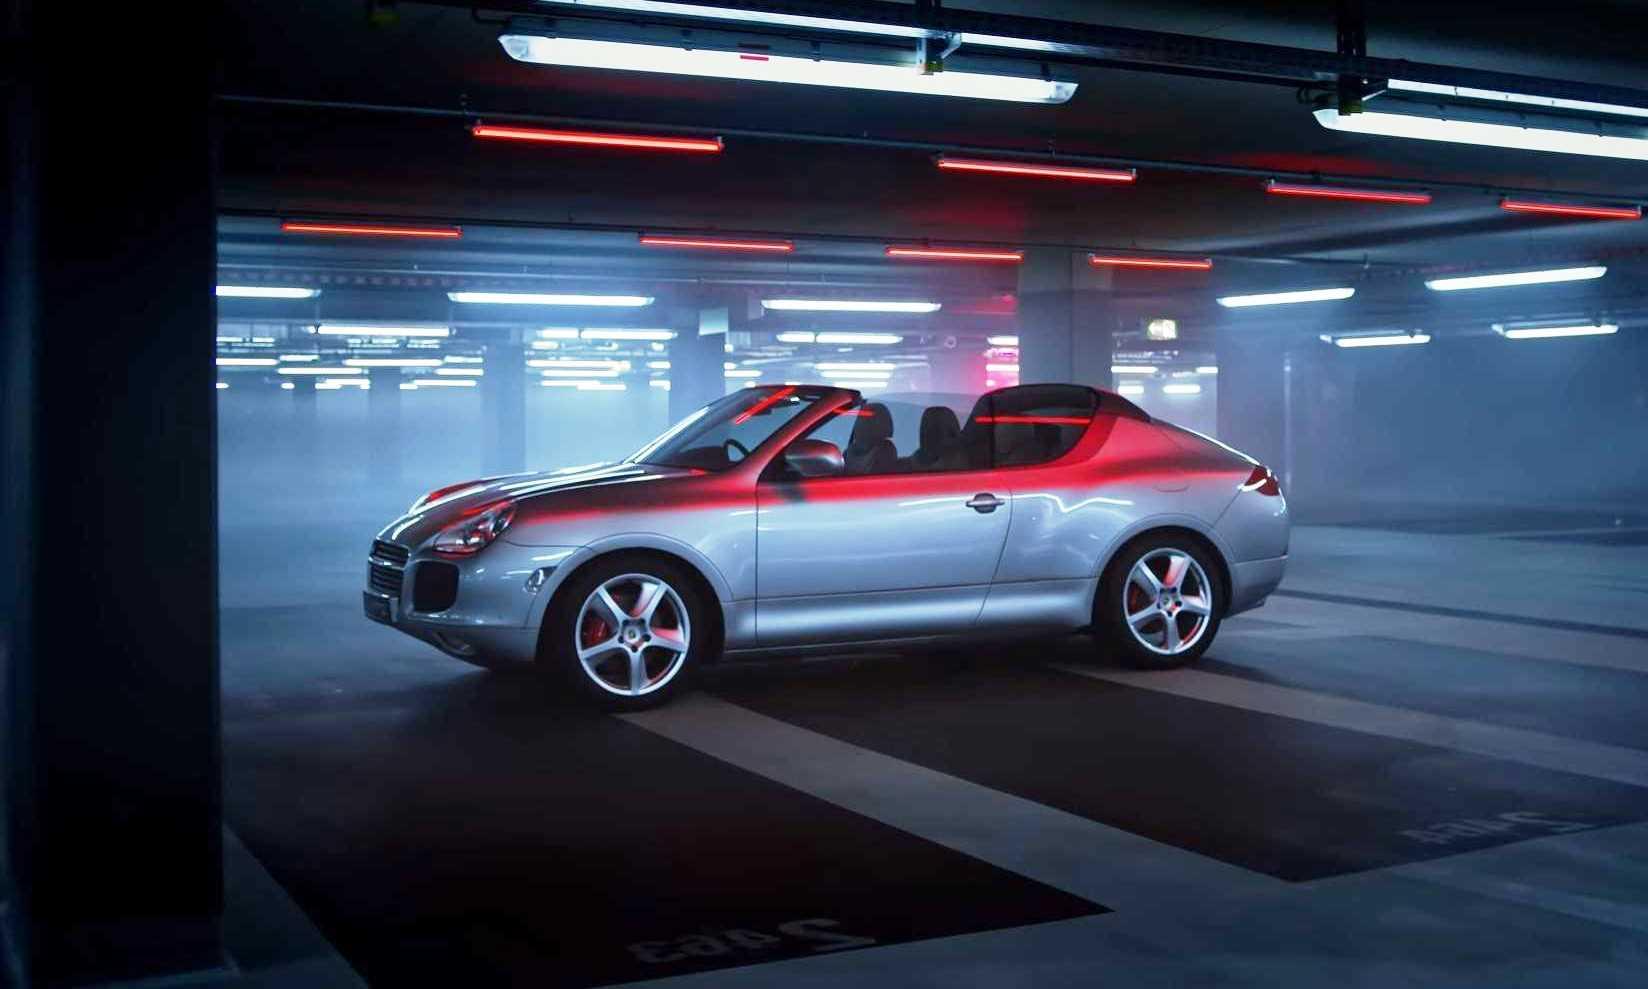 Porsche Cayenne Cabrio prototype